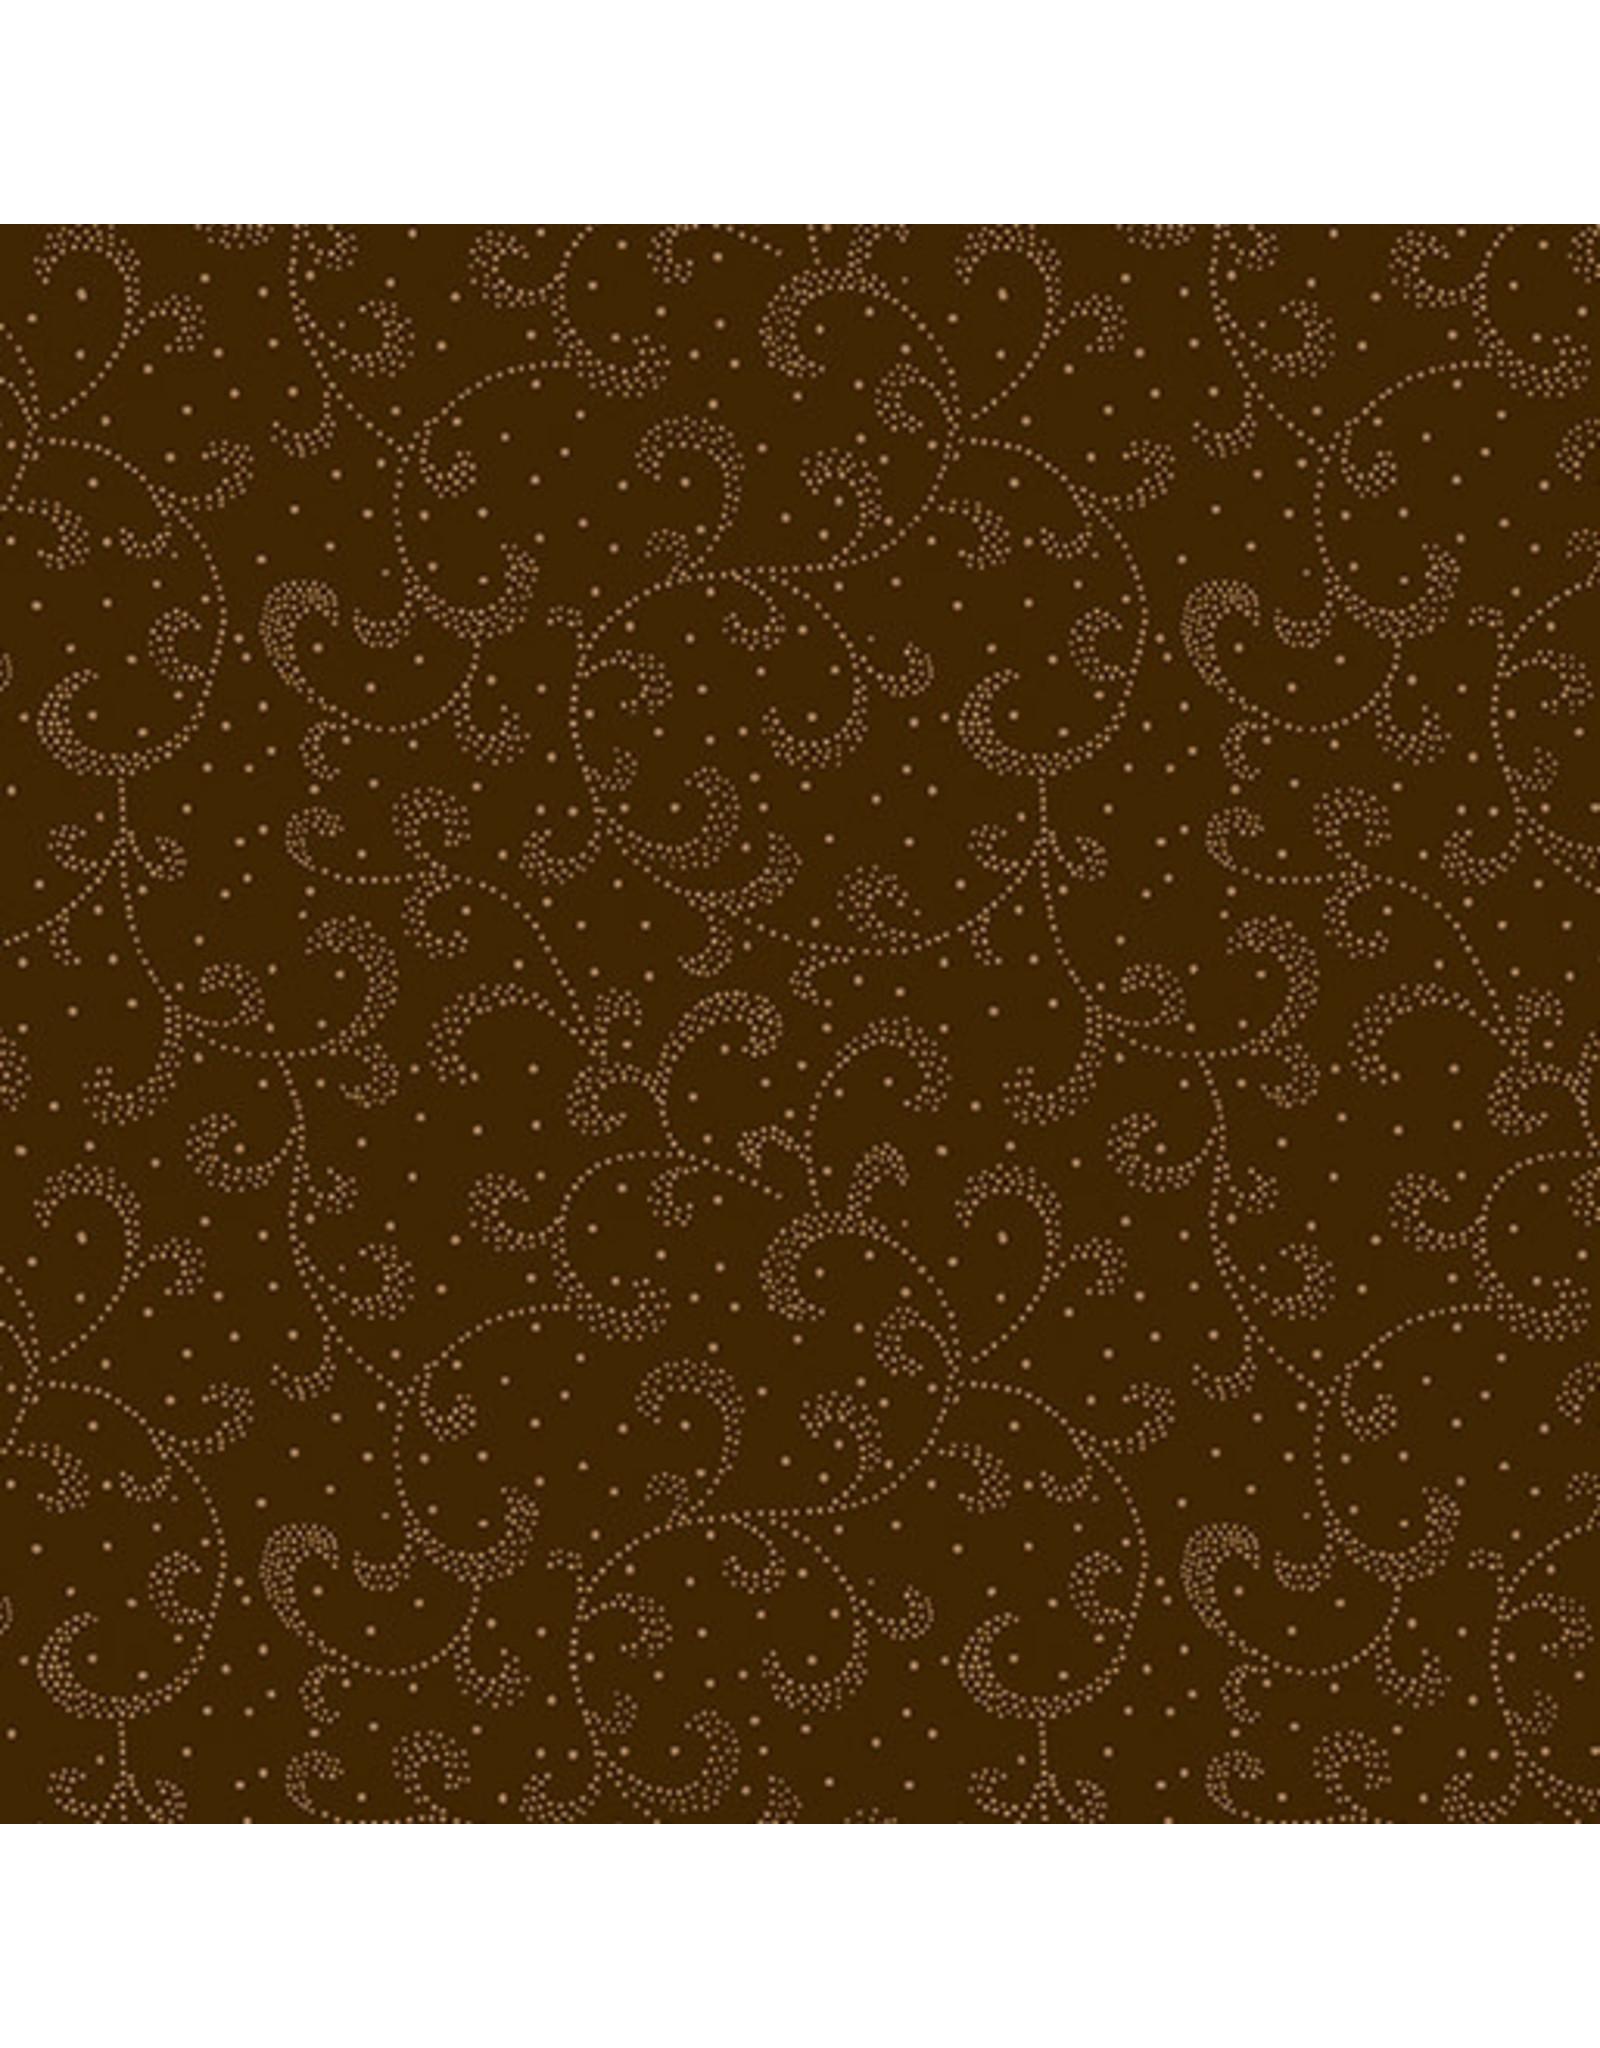 Kanvas Studio Swirling Scroll - Chestnut Brown